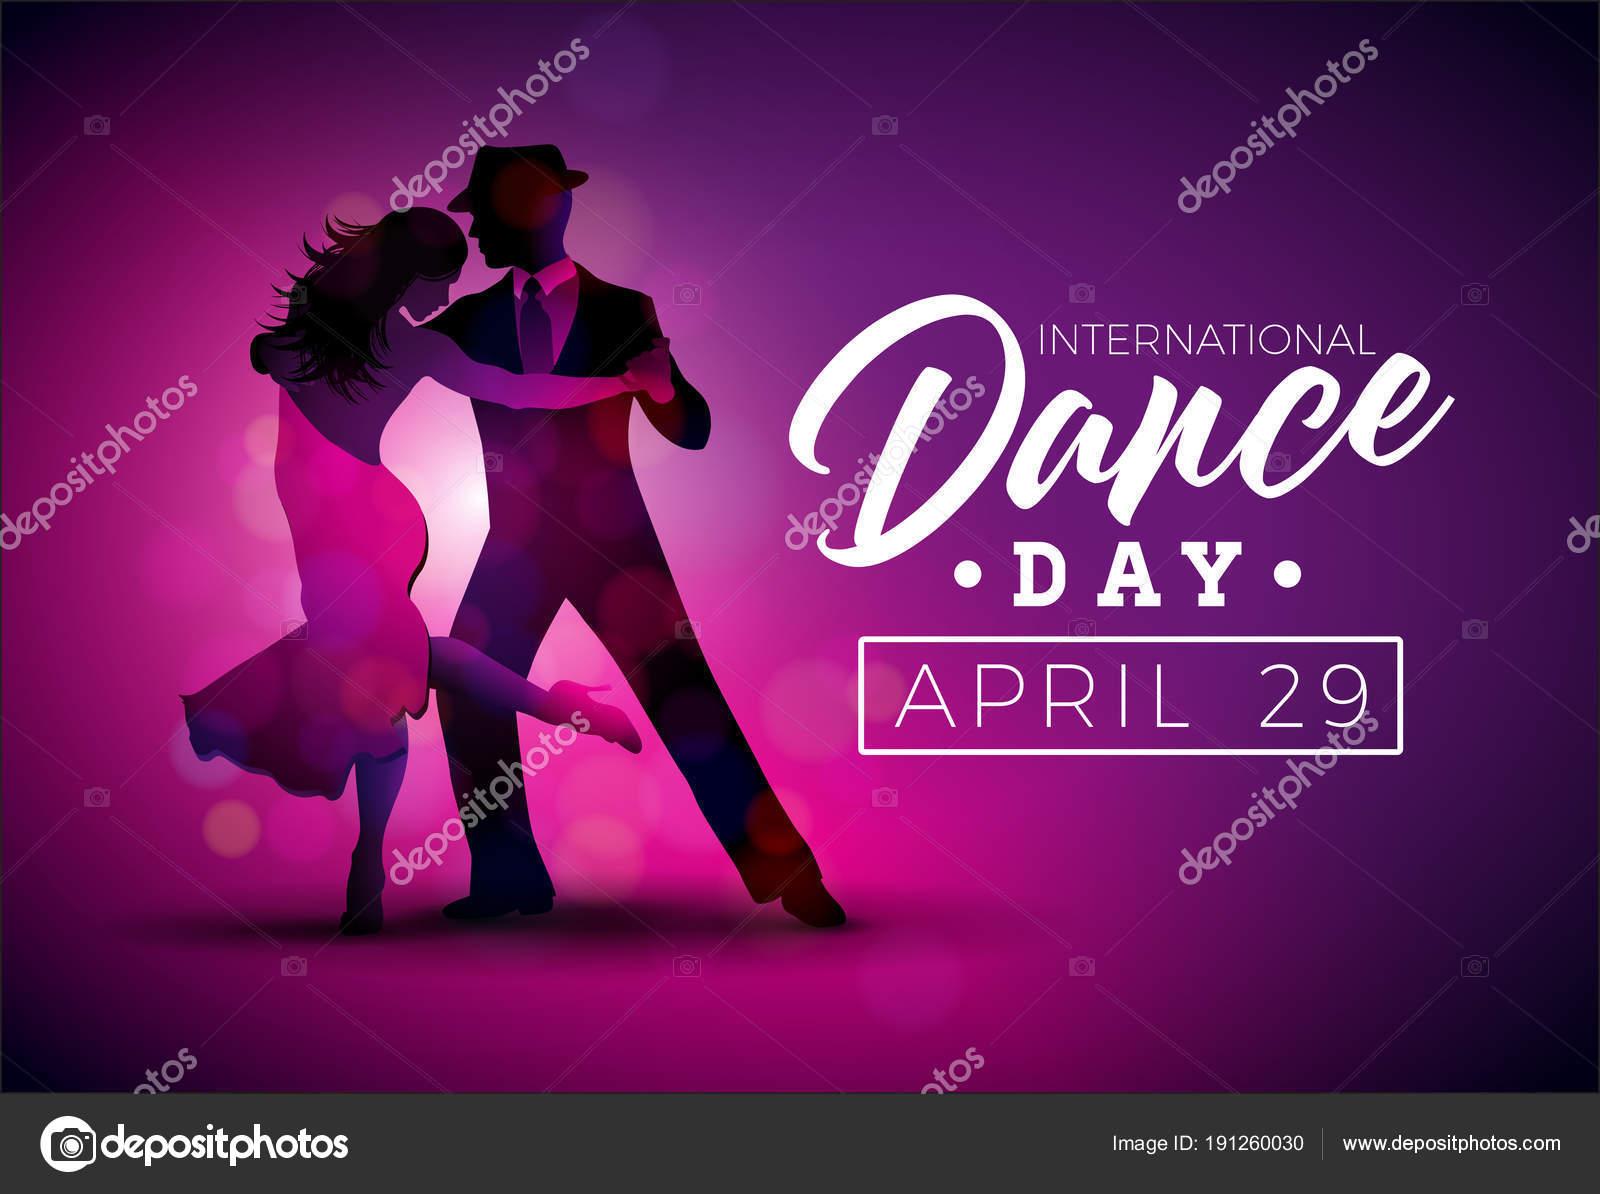 International Dance Day Vektor-Illustration mit Tango-Tanzpaar auf ...